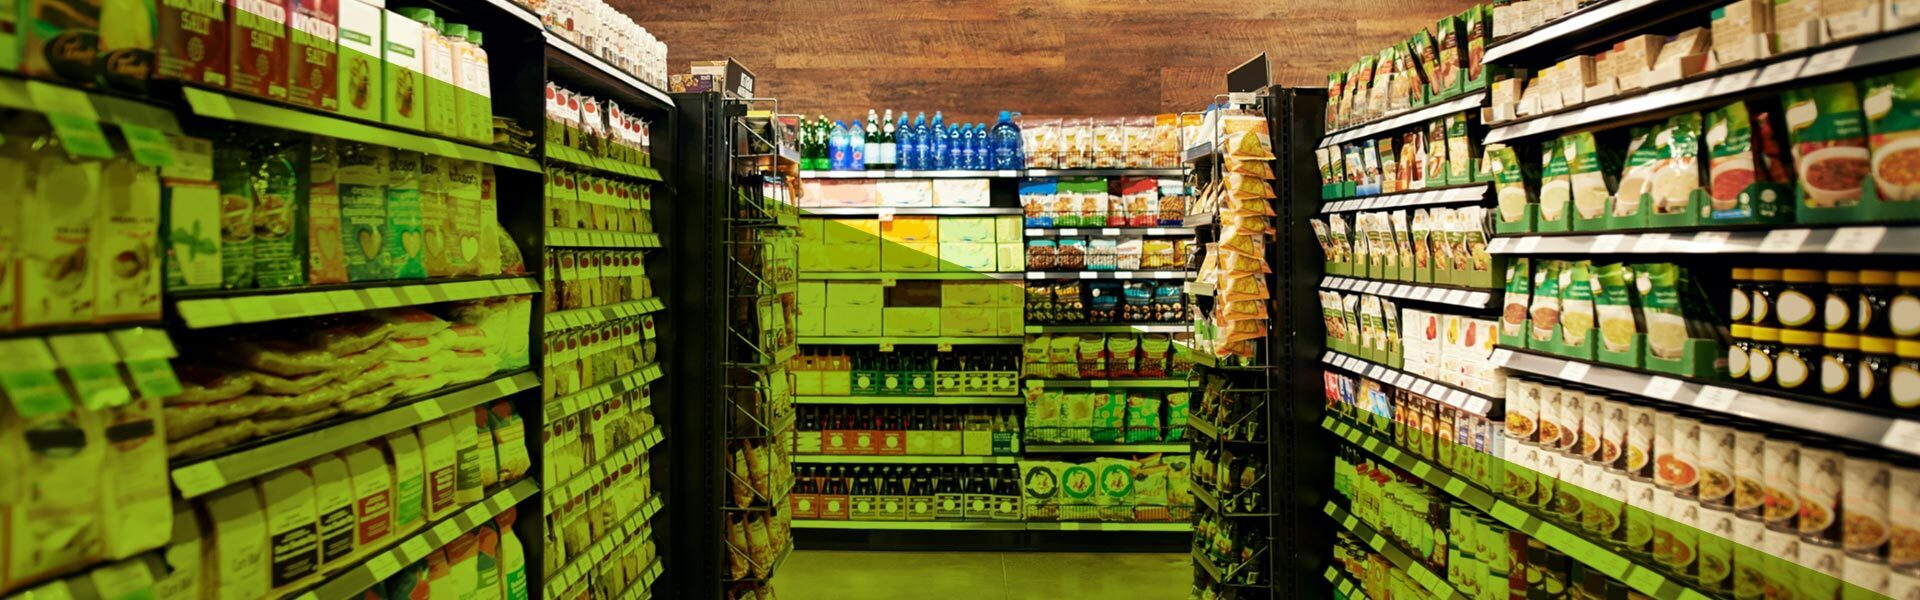 Stocktaker Convenience Stores UK